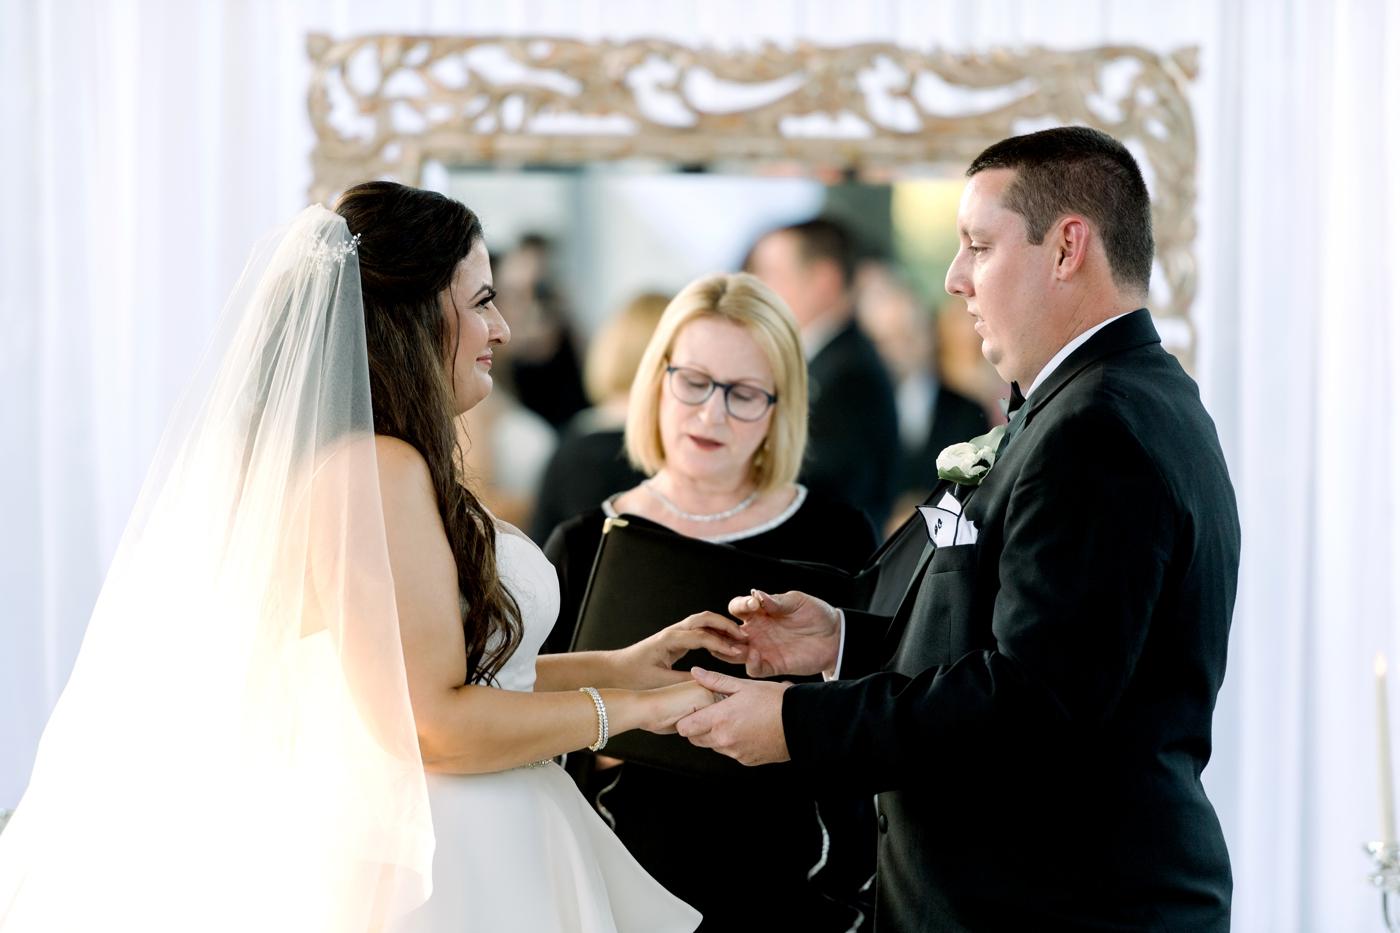 wedding ceremony photography orlando